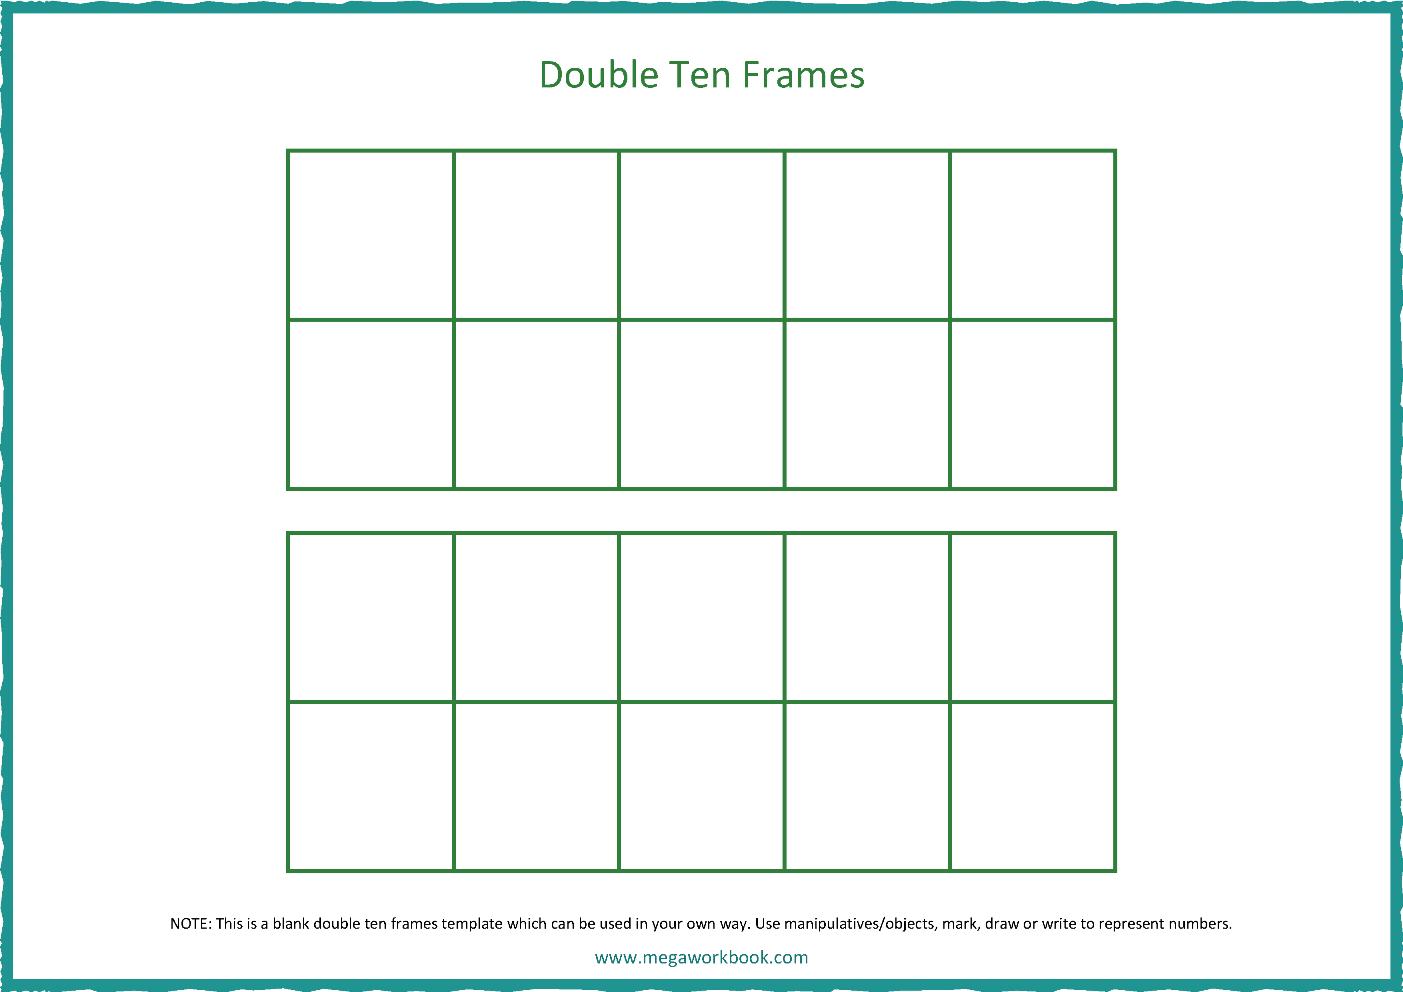 Ten Frame Template Blank Ten Frames Double Ten Frames Megaworkbook